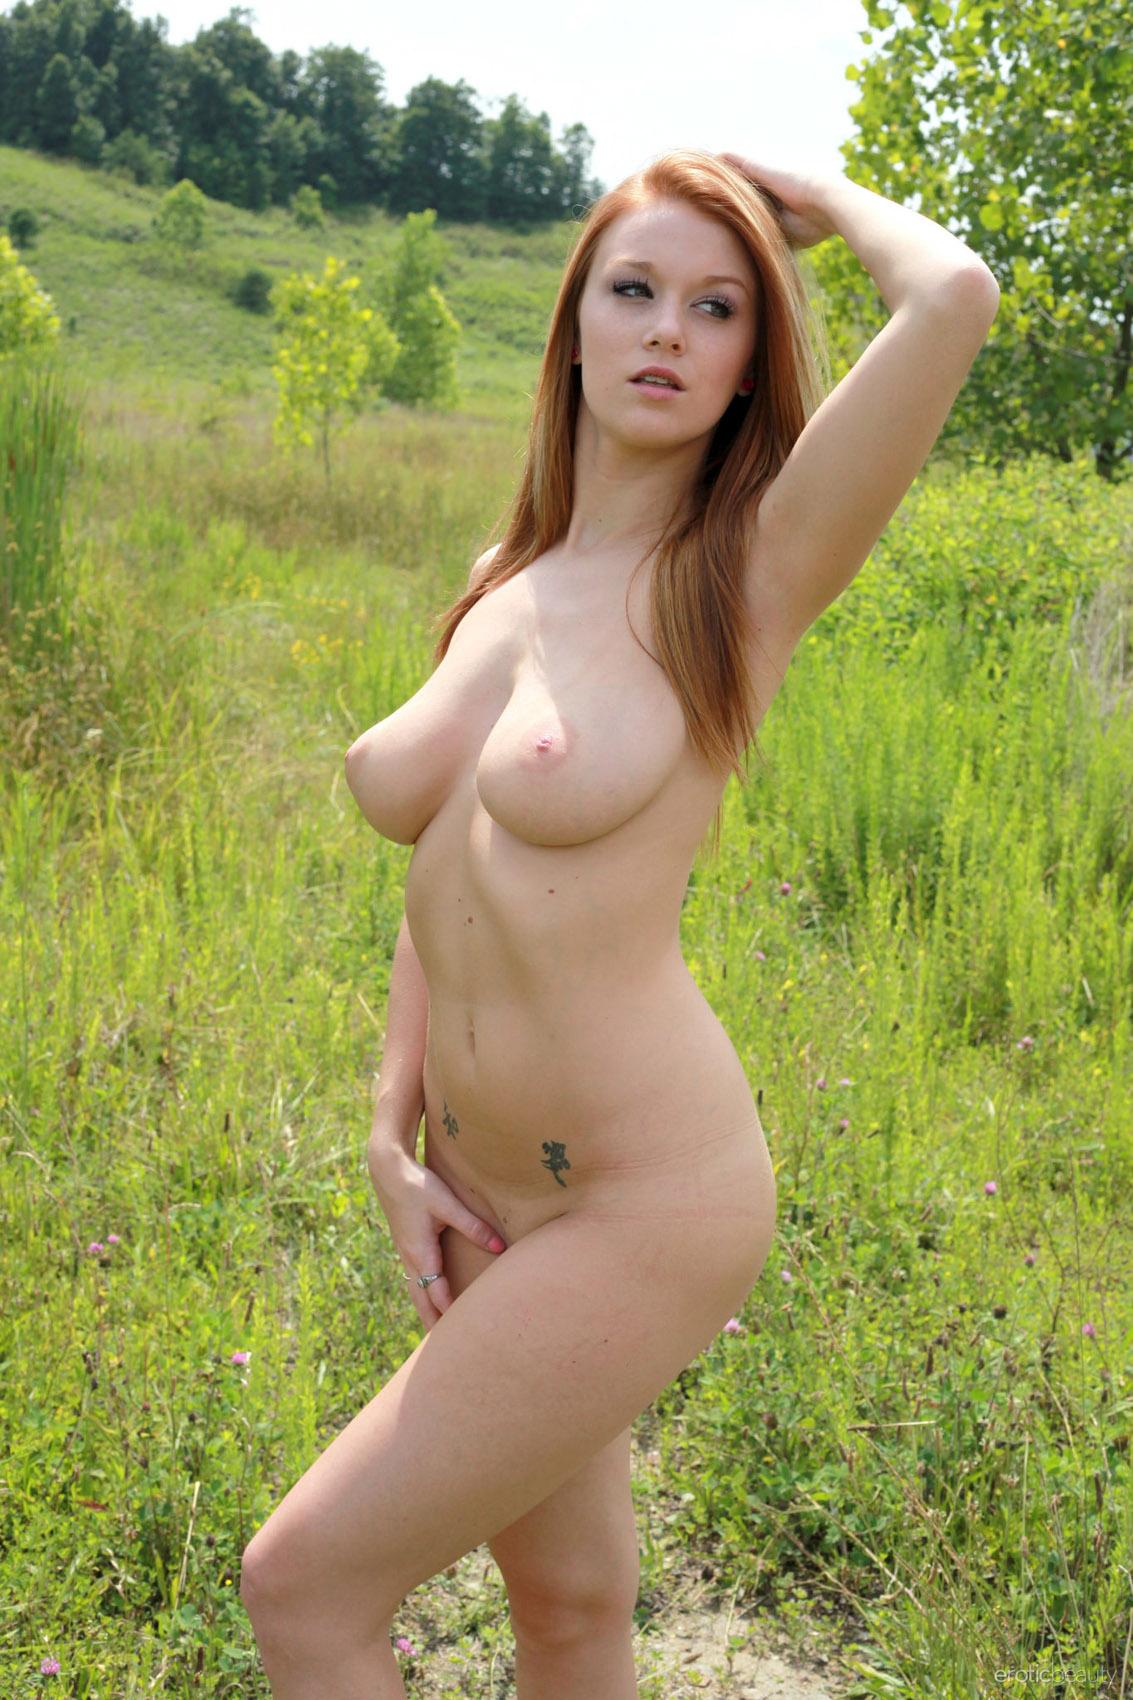 leanna decker nude amateur